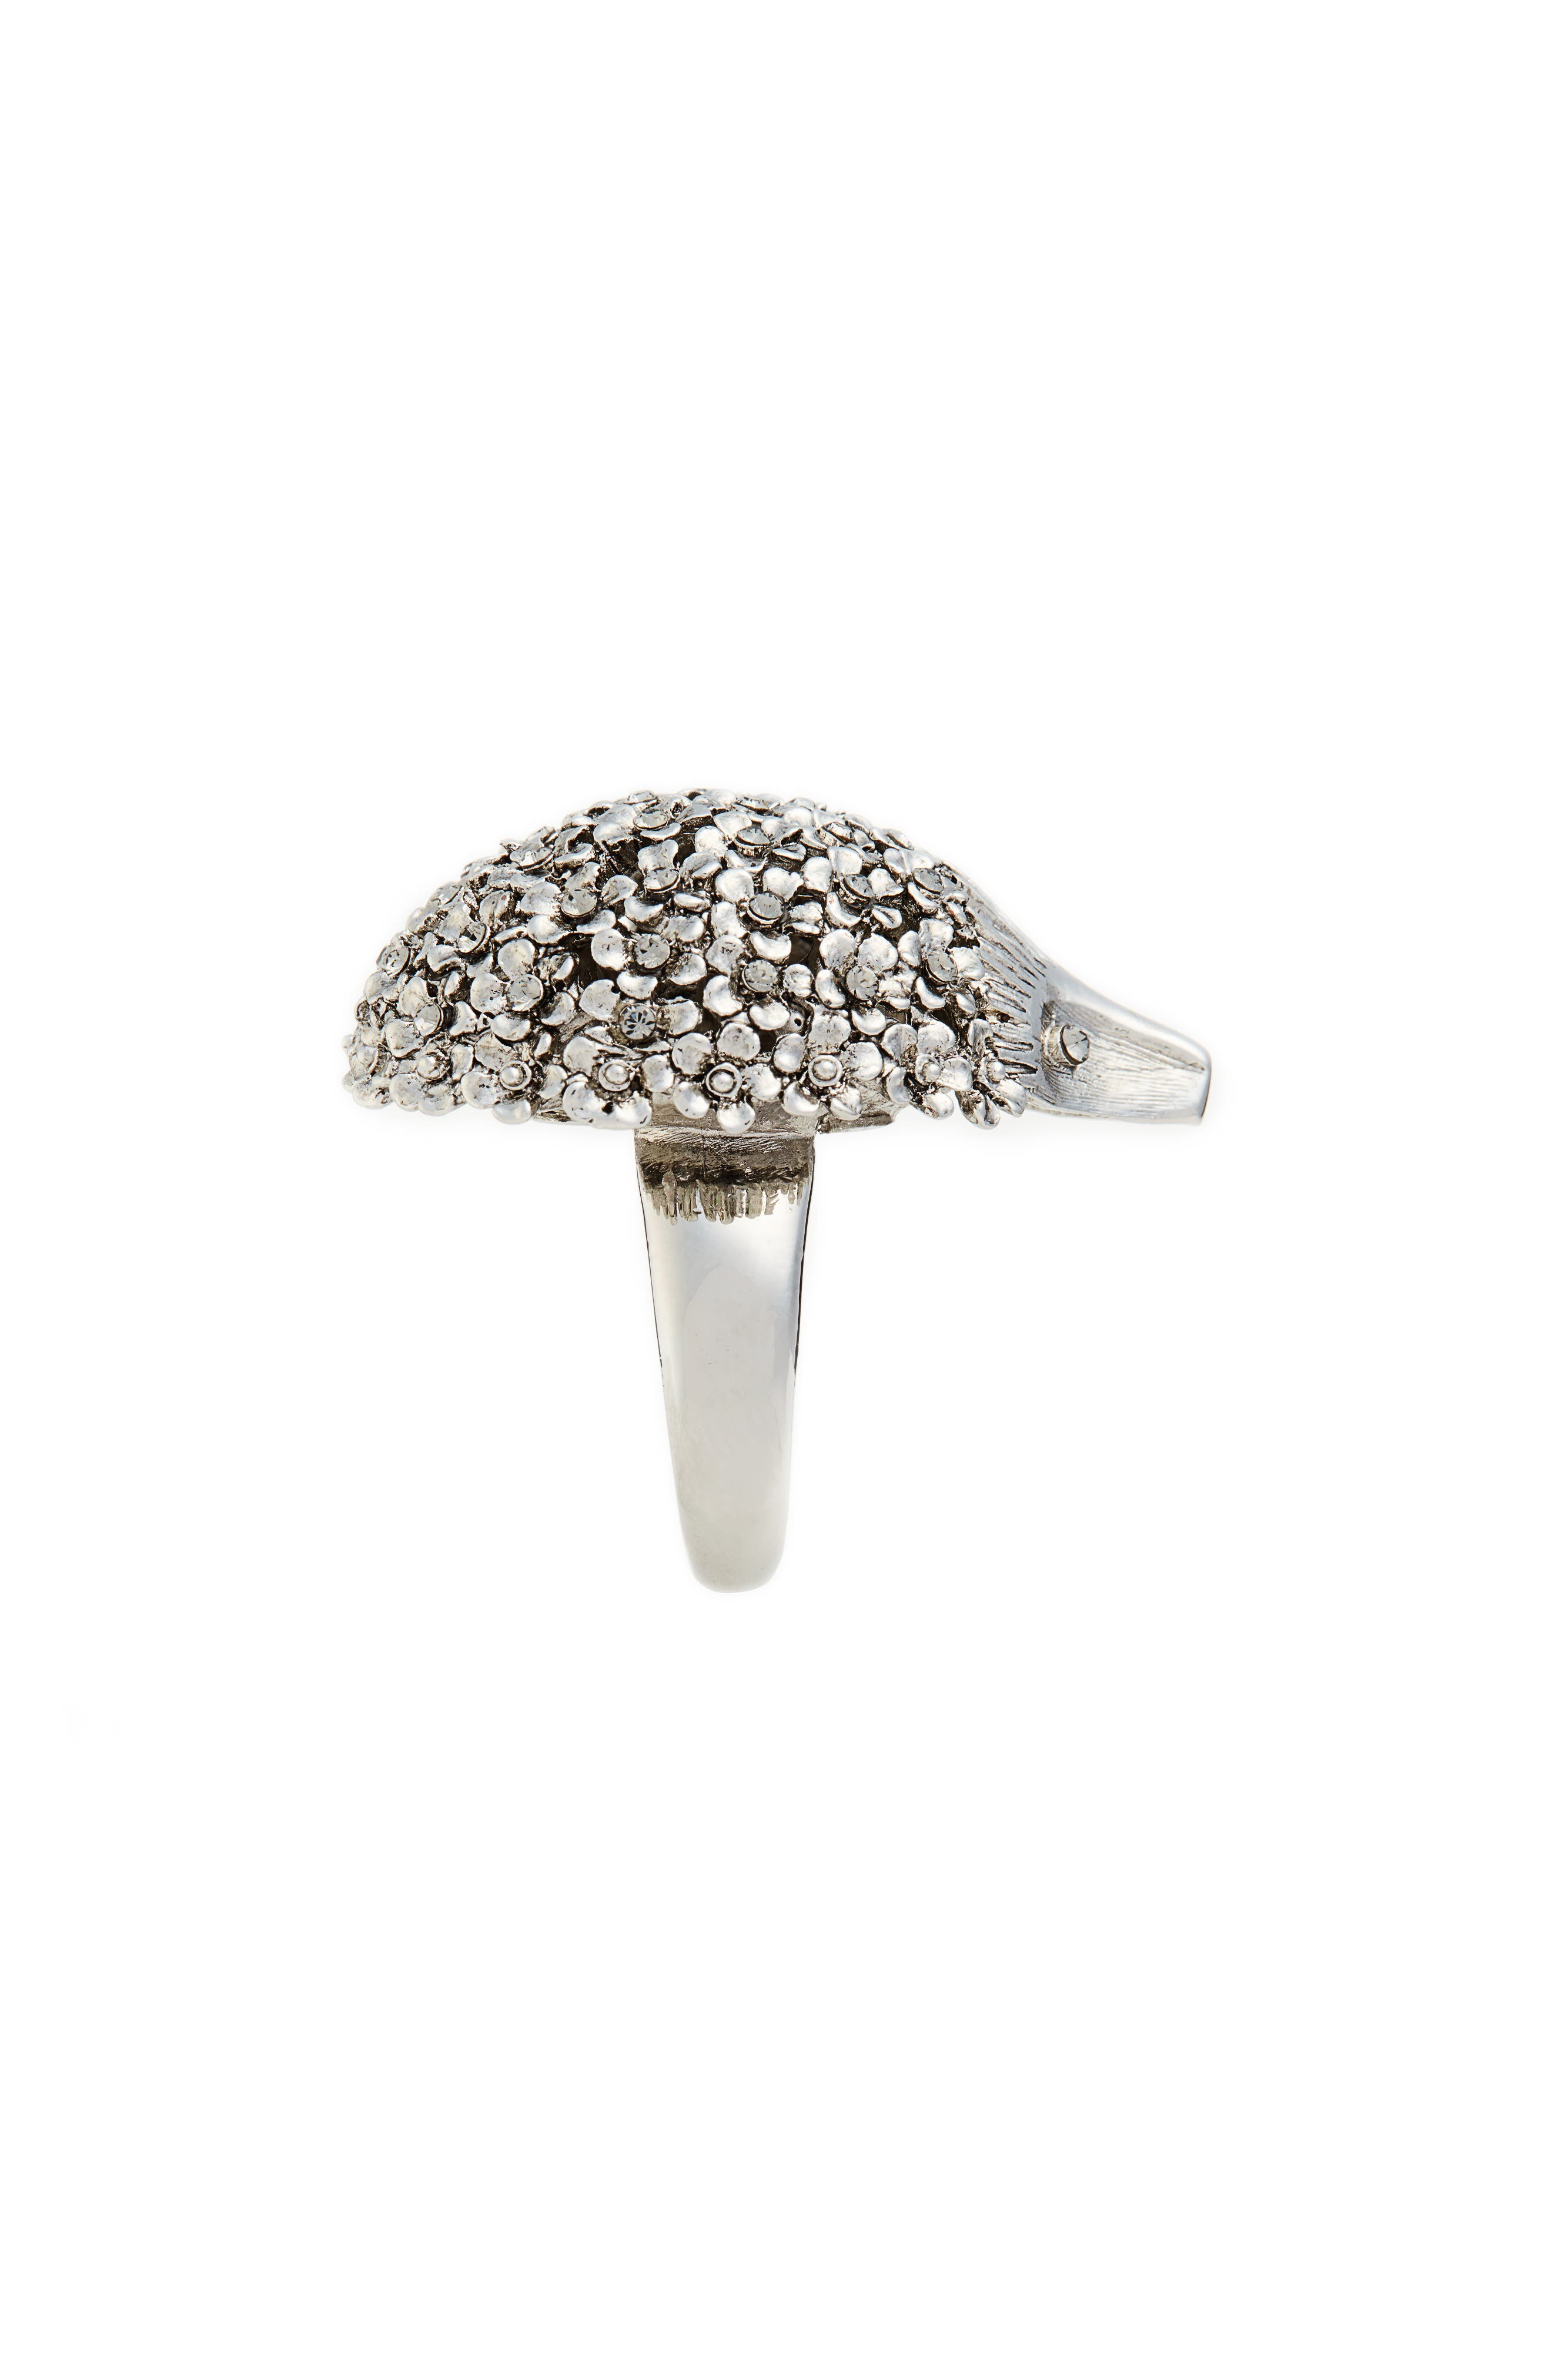 Crystal Hedgehog Ring,                             Alternate thumbnail 2, color,                             001